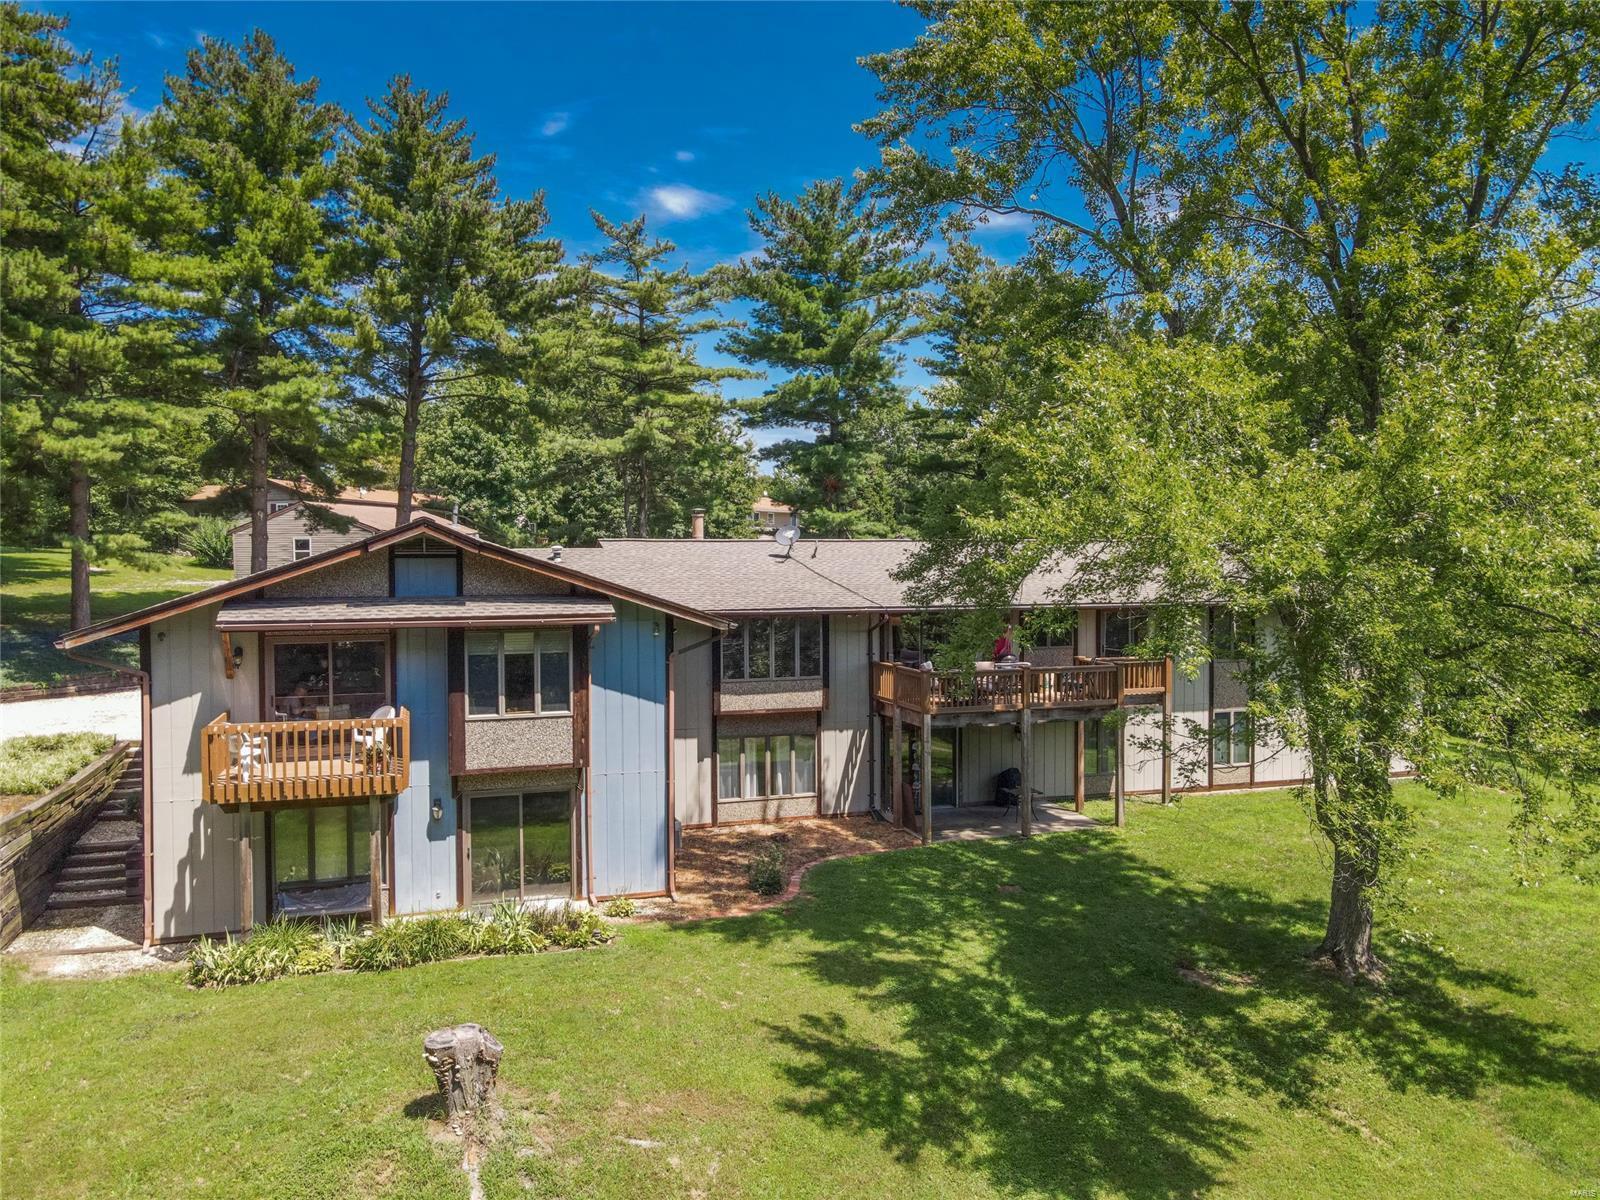 25402 S Elsah Hills Property Photo - Elsah, IL real estate listing